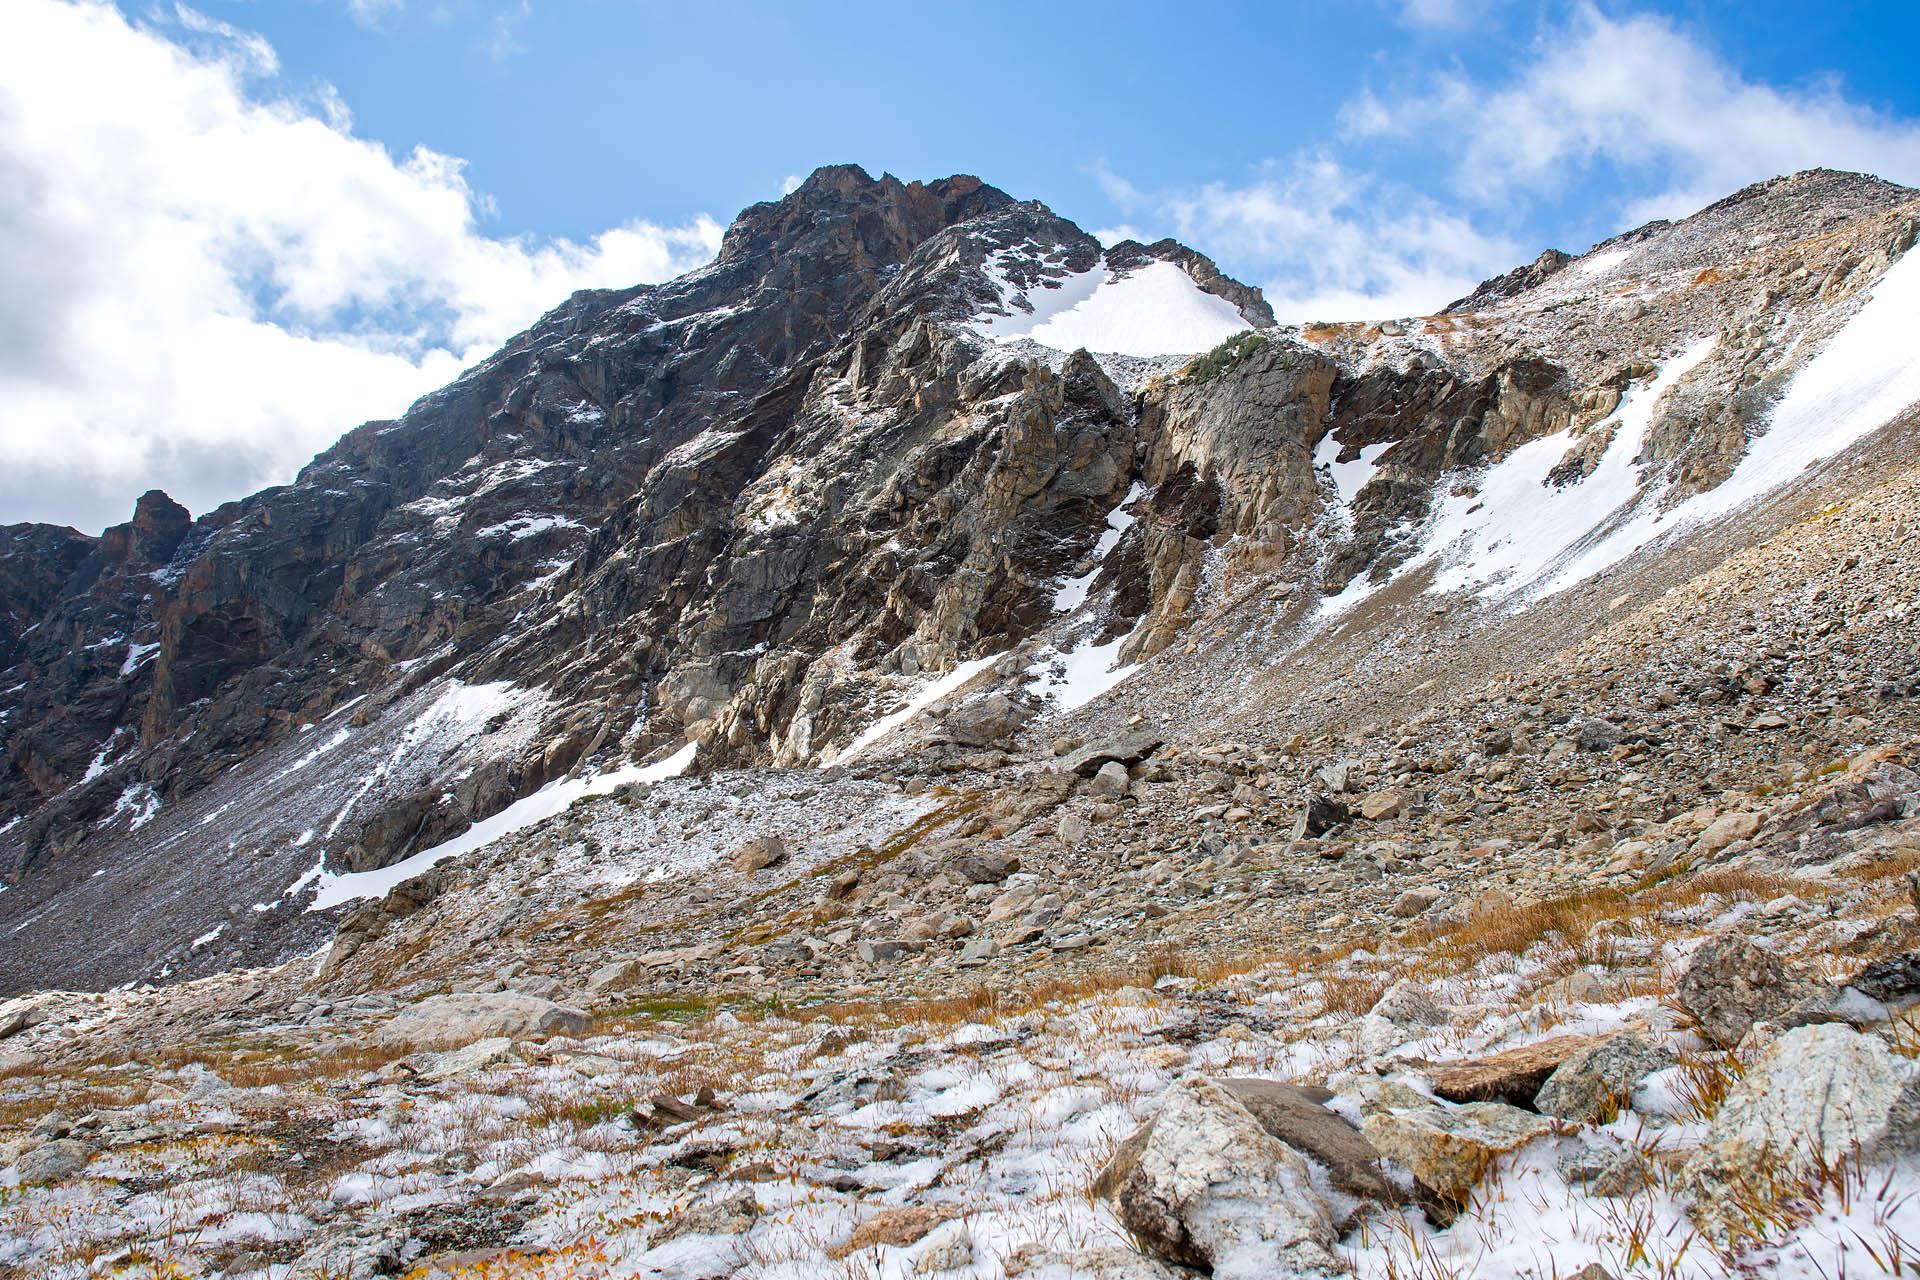 Rockchuck Peak